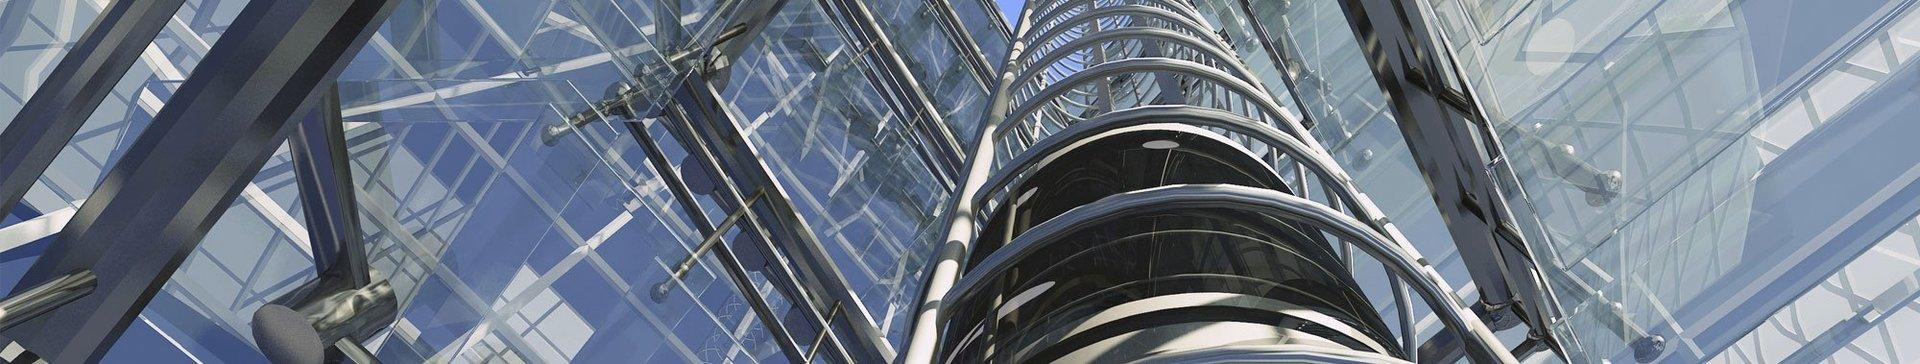 ascensori grattacieli